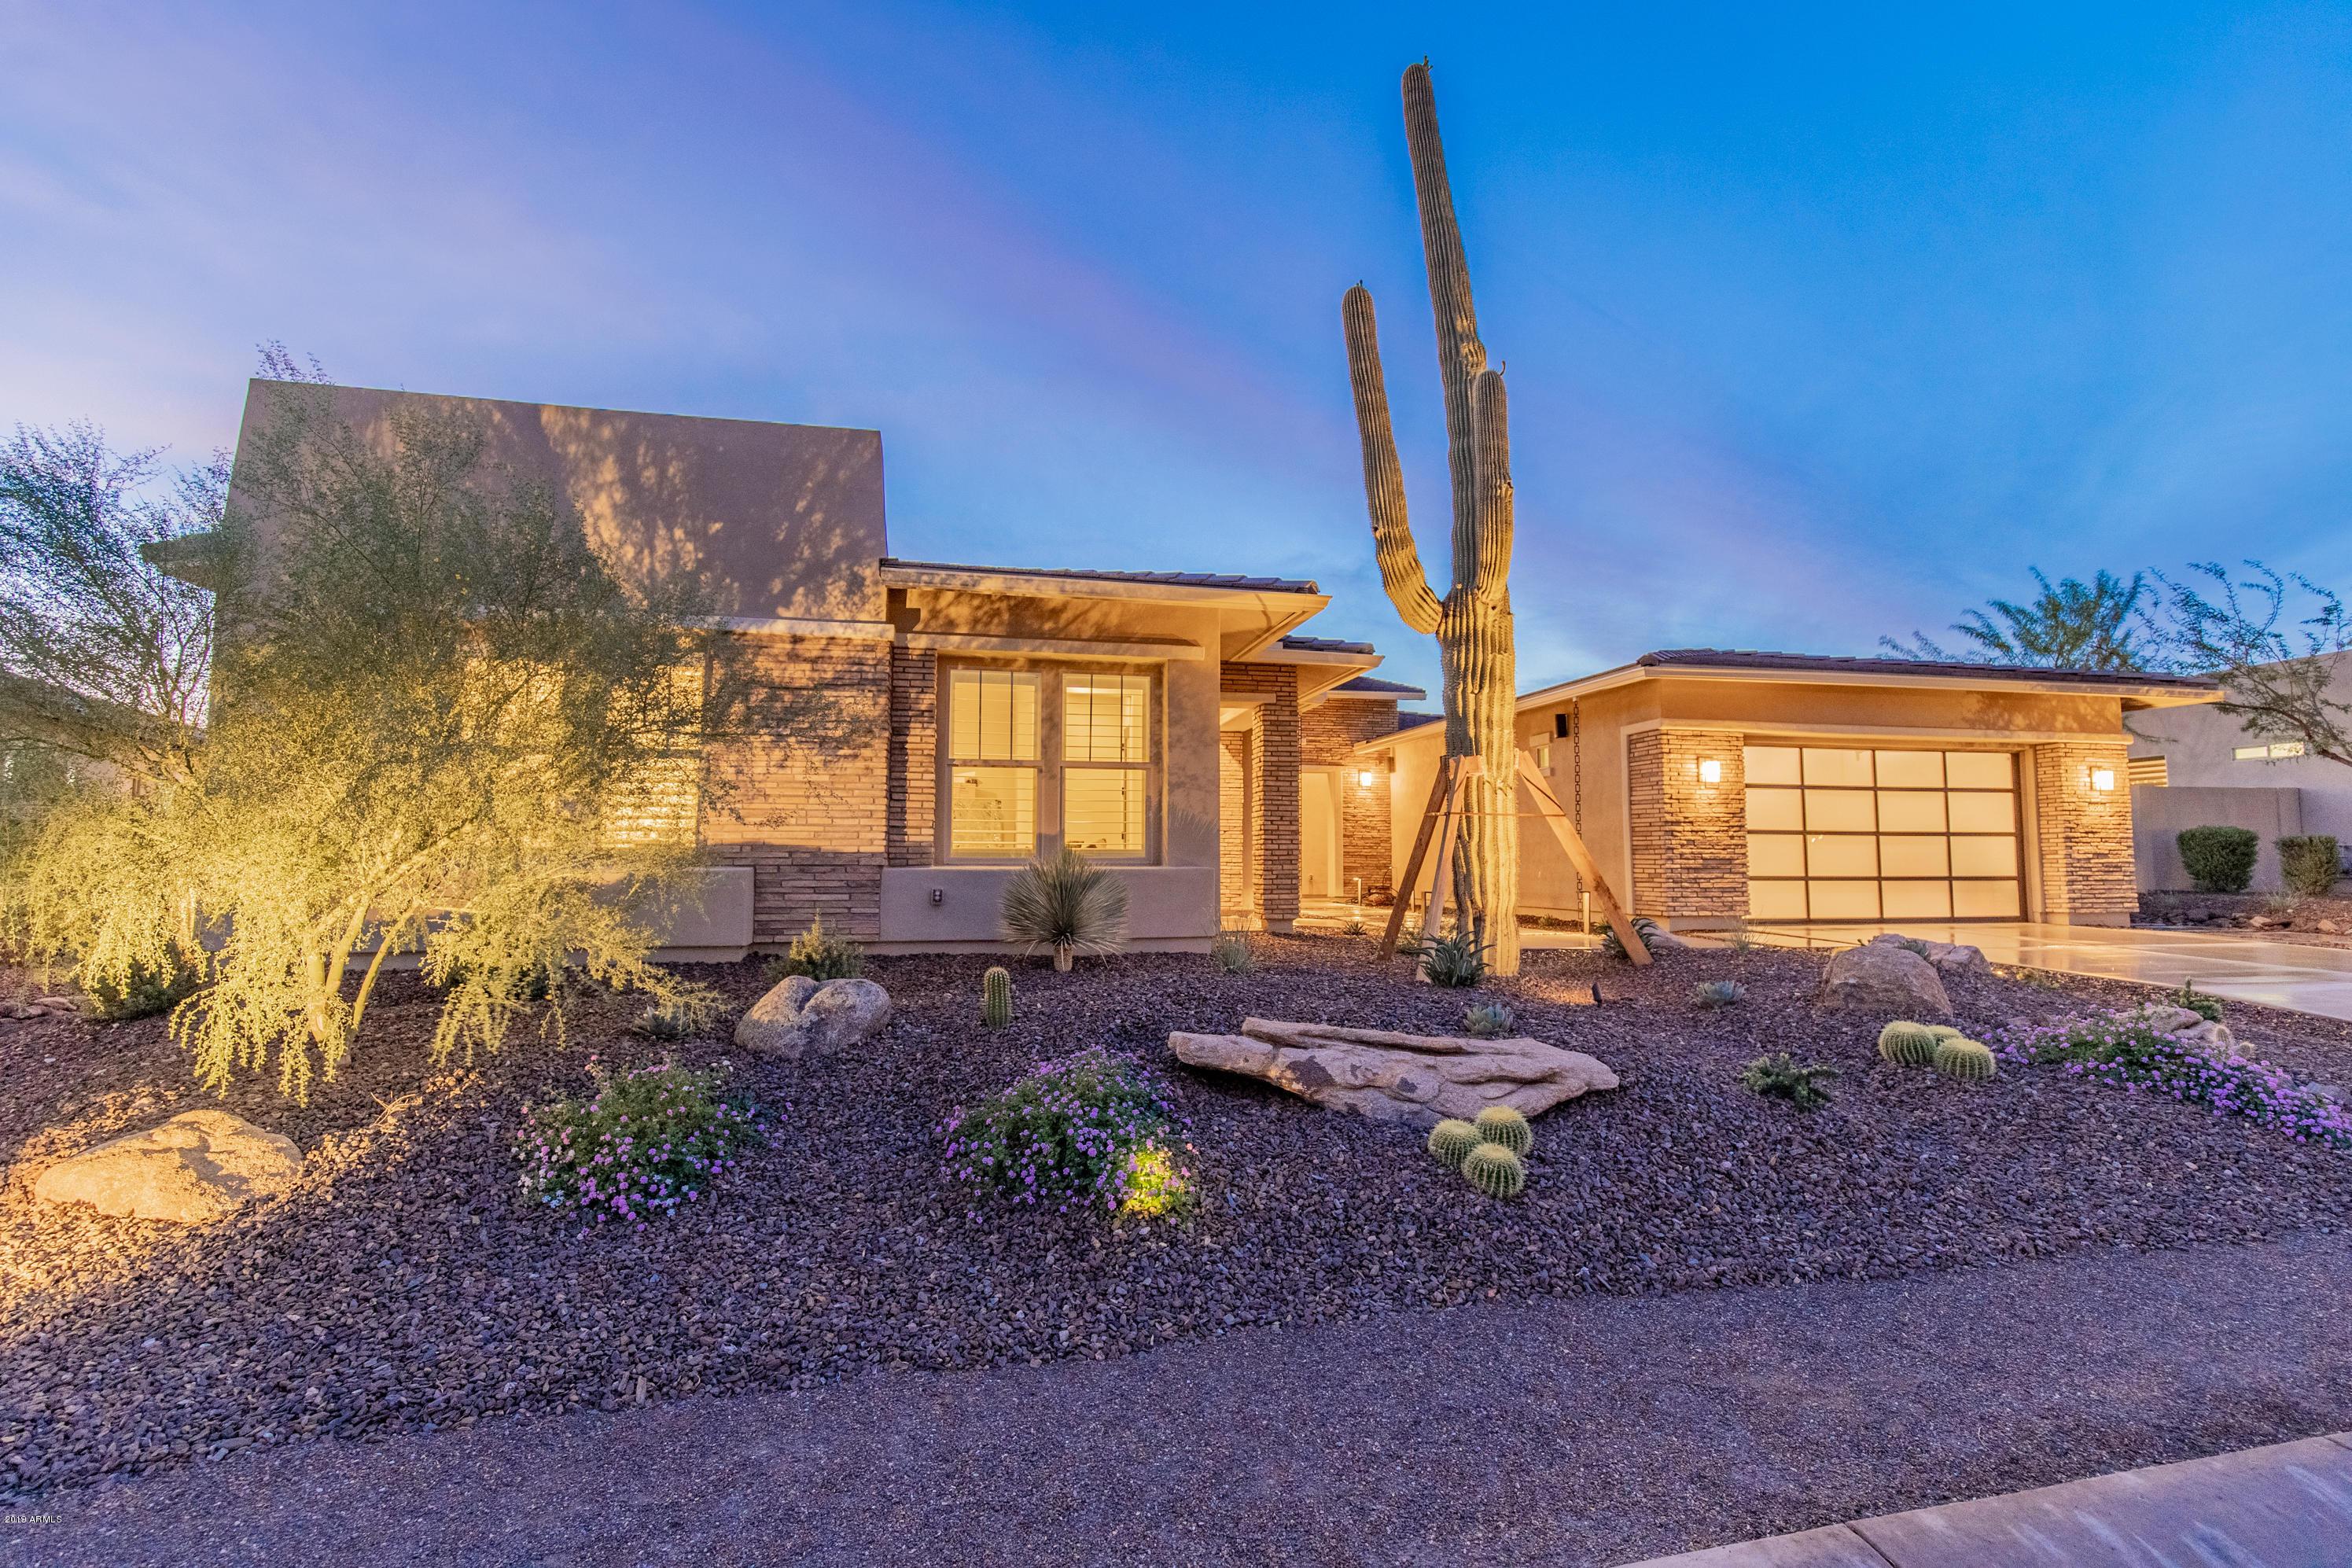 Photo of 30588 N 117TH Drive, Peoria, AZ 85383